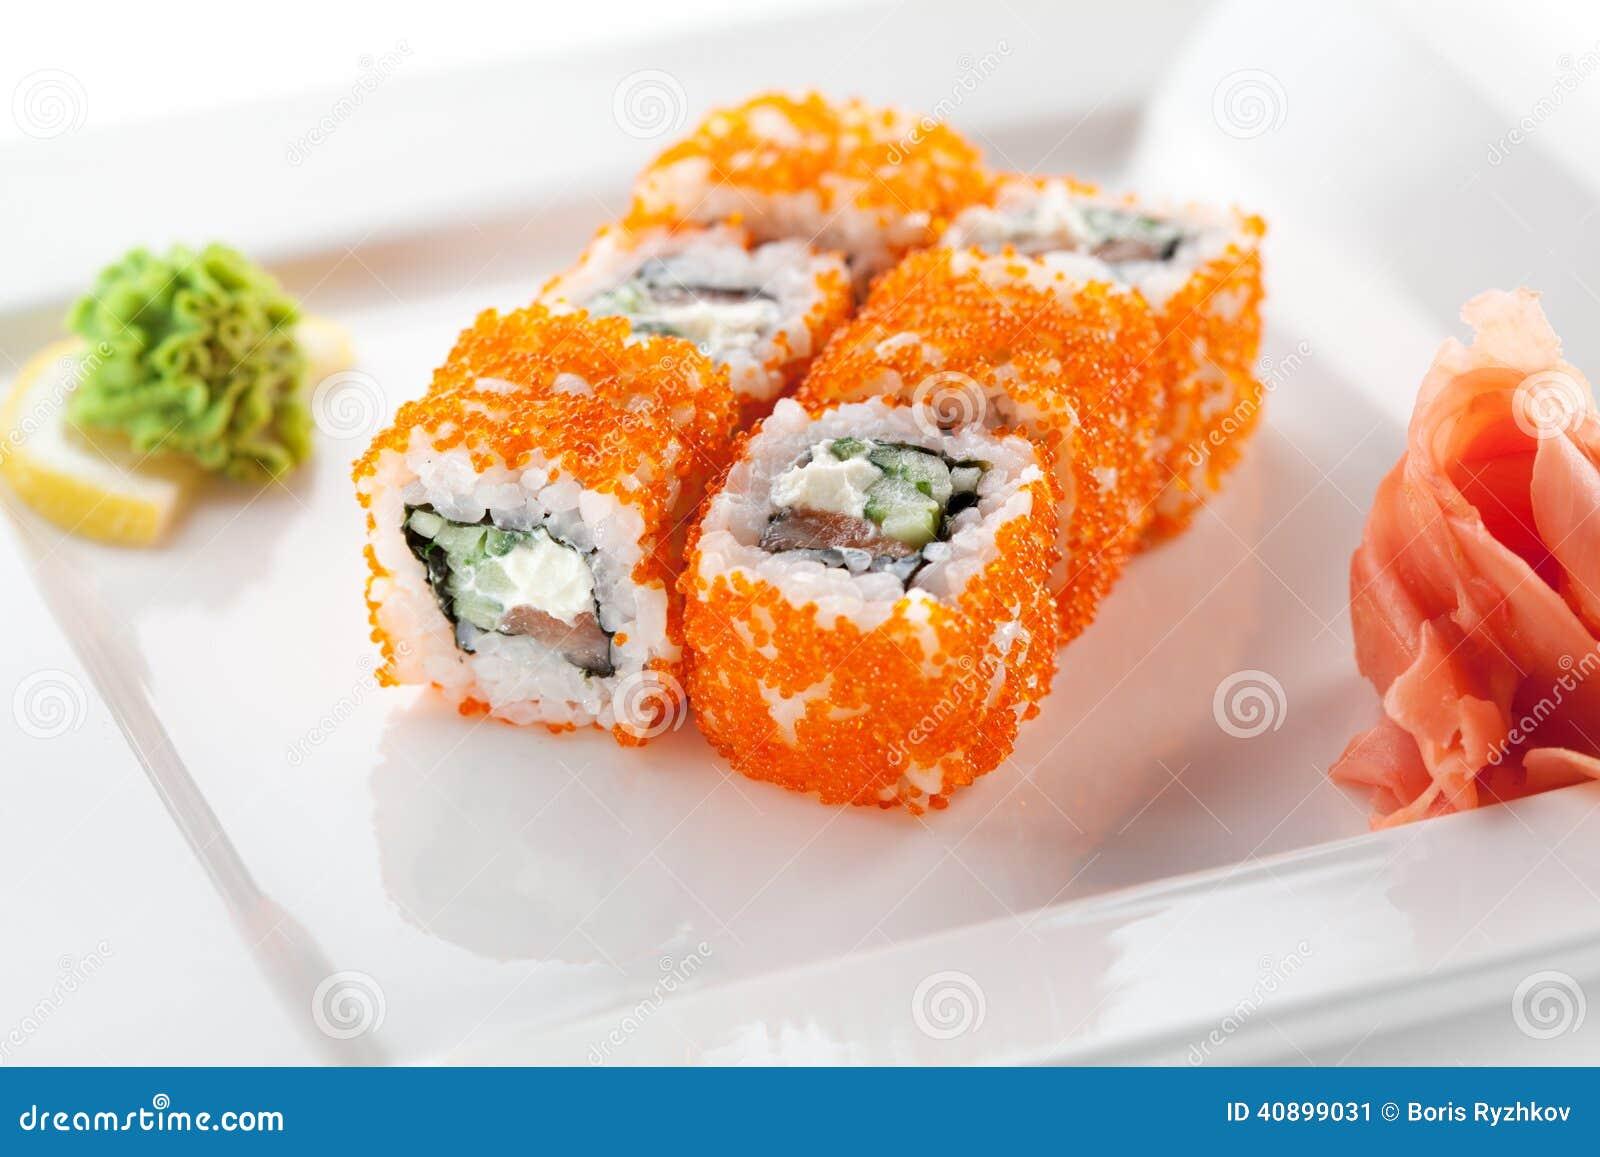 Salmon And Tobiko Roll Stock Photo Image 40899031